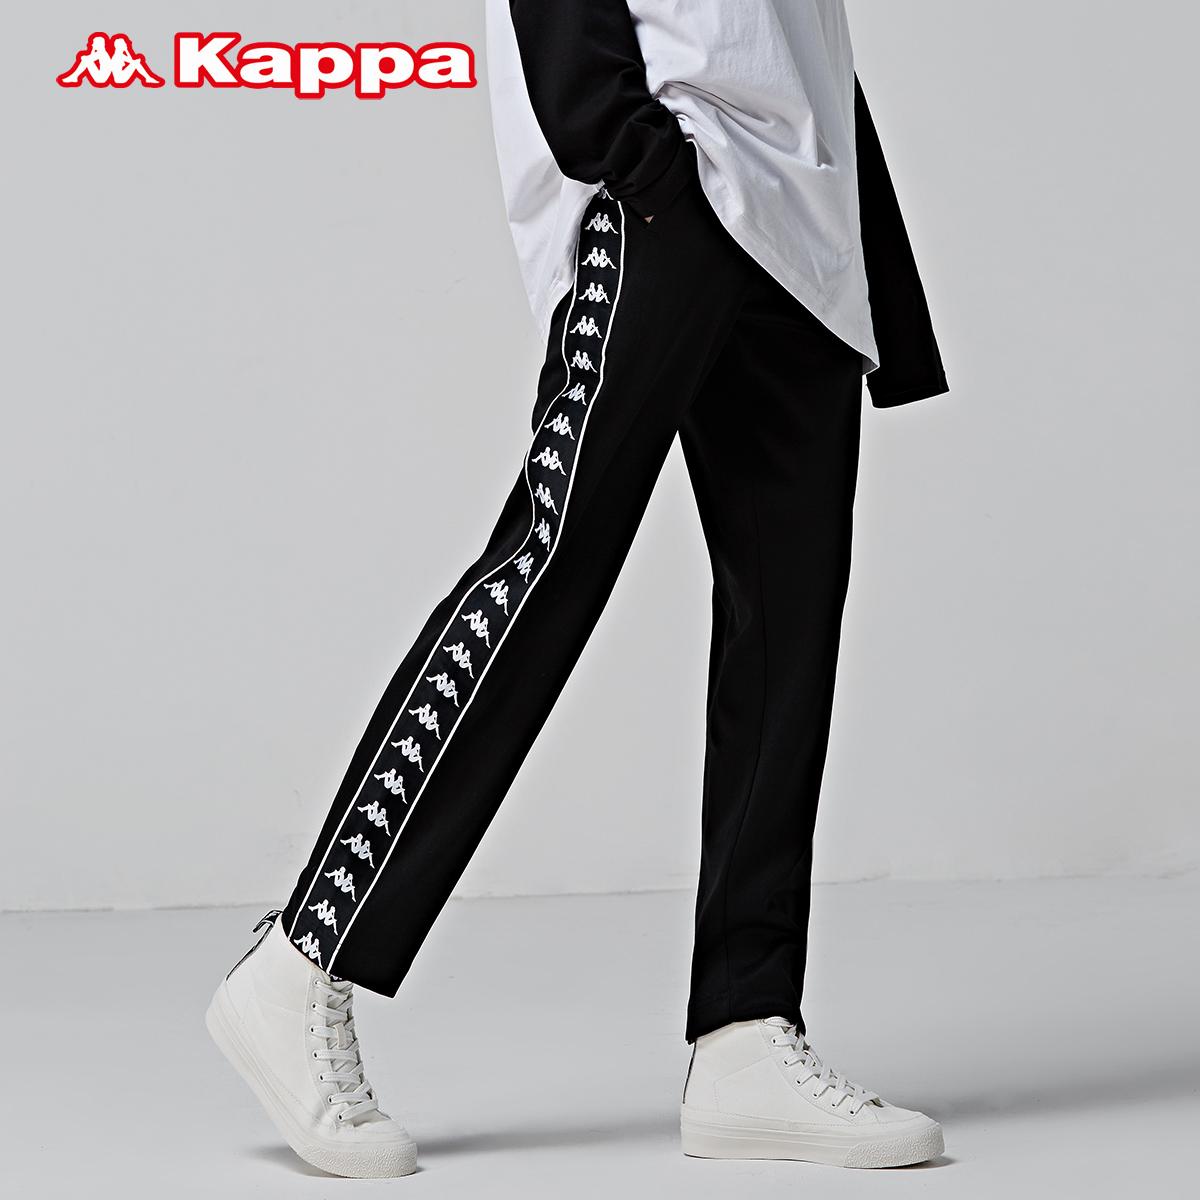 KAPPA卡帕 女款banda串标运动裤长裤休闲卫裤2018新品|K0862AK58